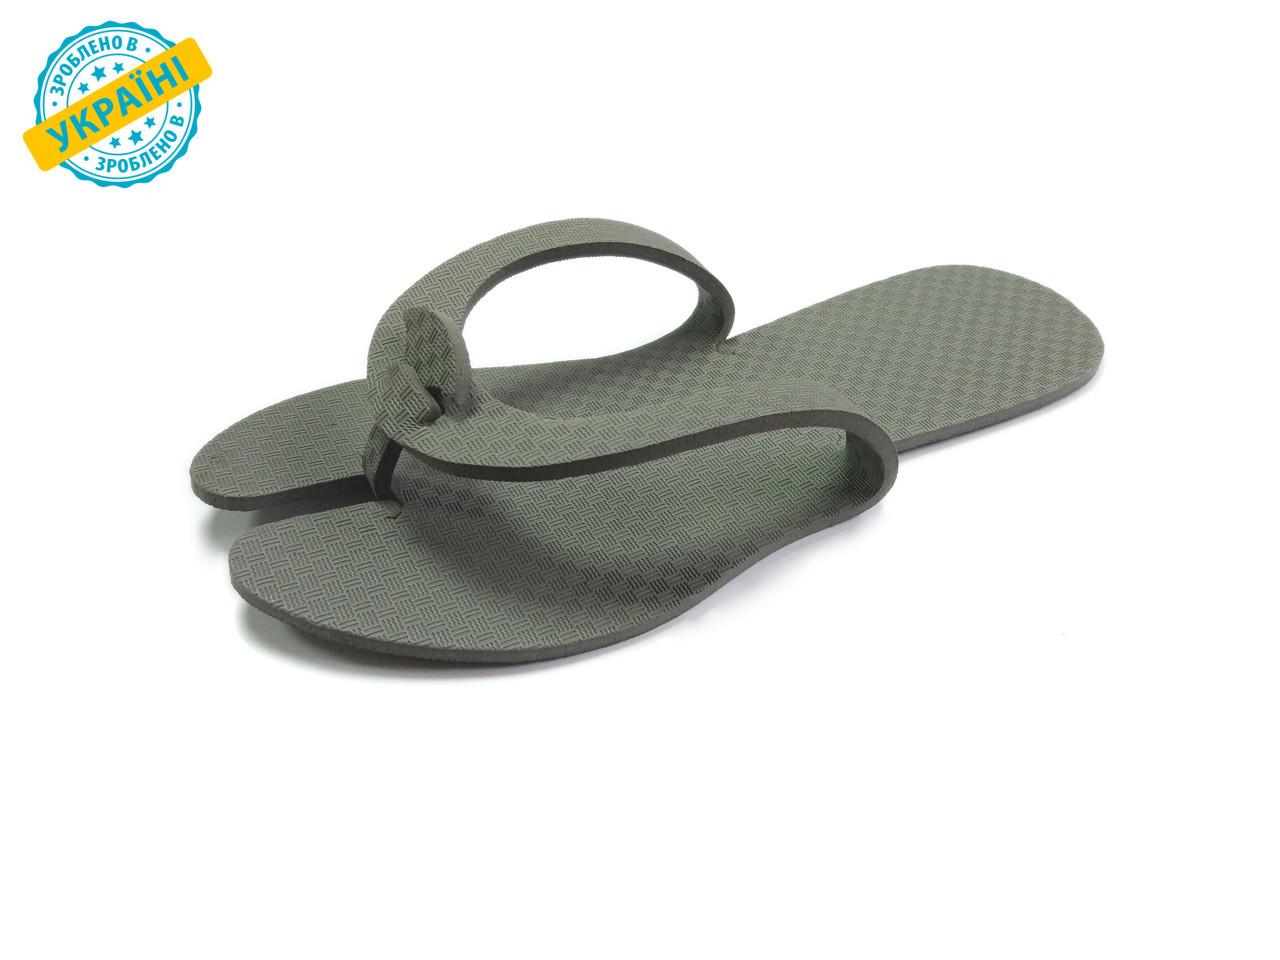 Одноразовые тапочки-вьетнамки(бабочки) для салонов мужские Eva-Line  3 мм